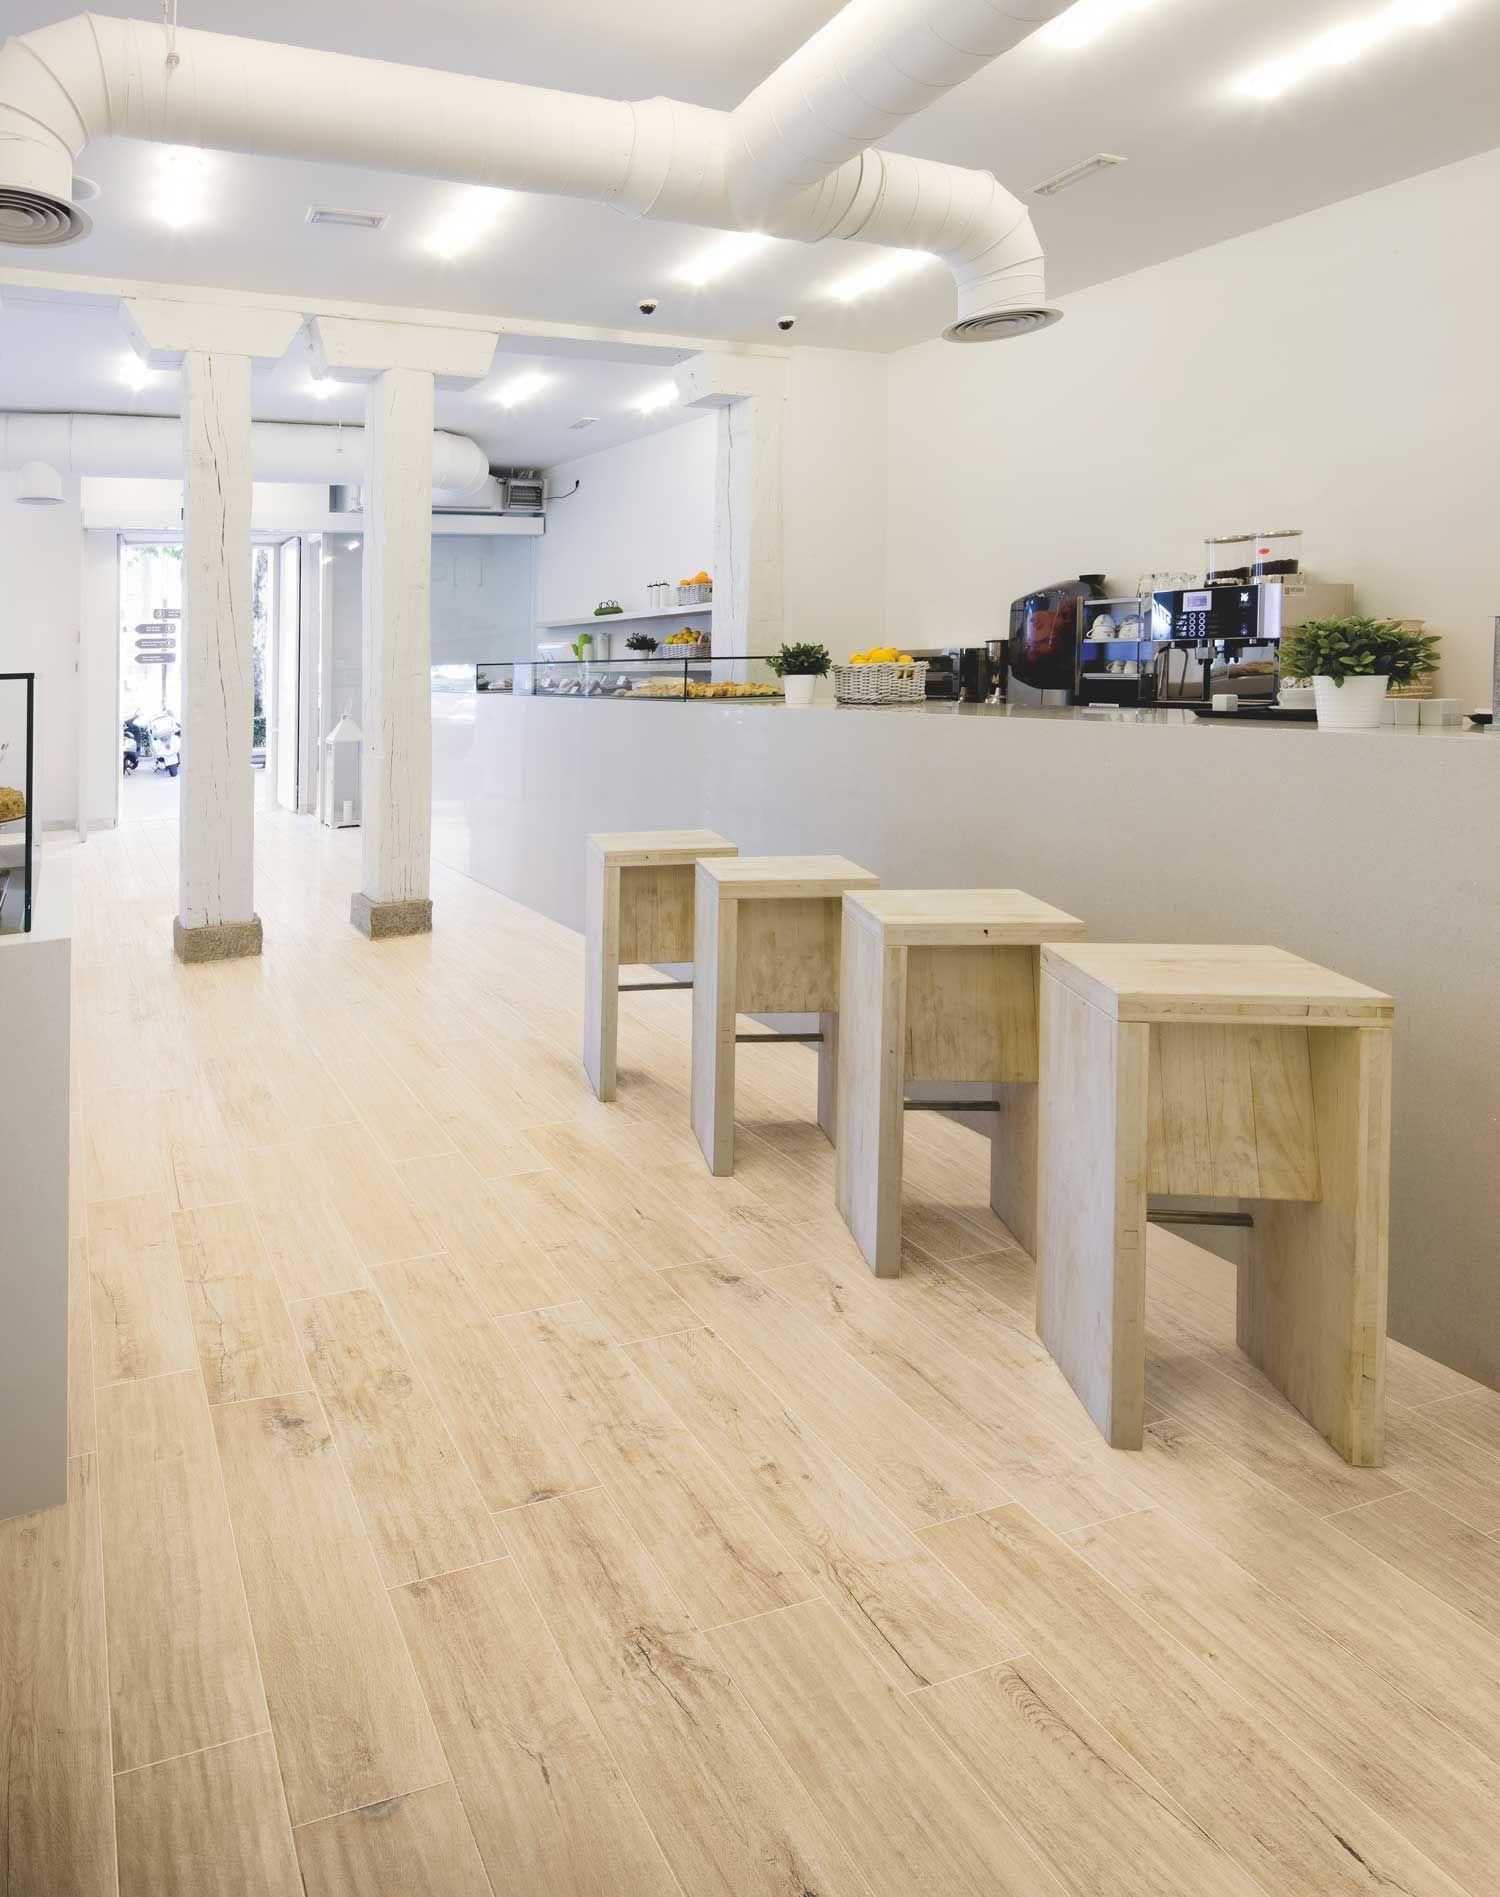 Logwood Italian Floor & Wall Tile. Click on the image to